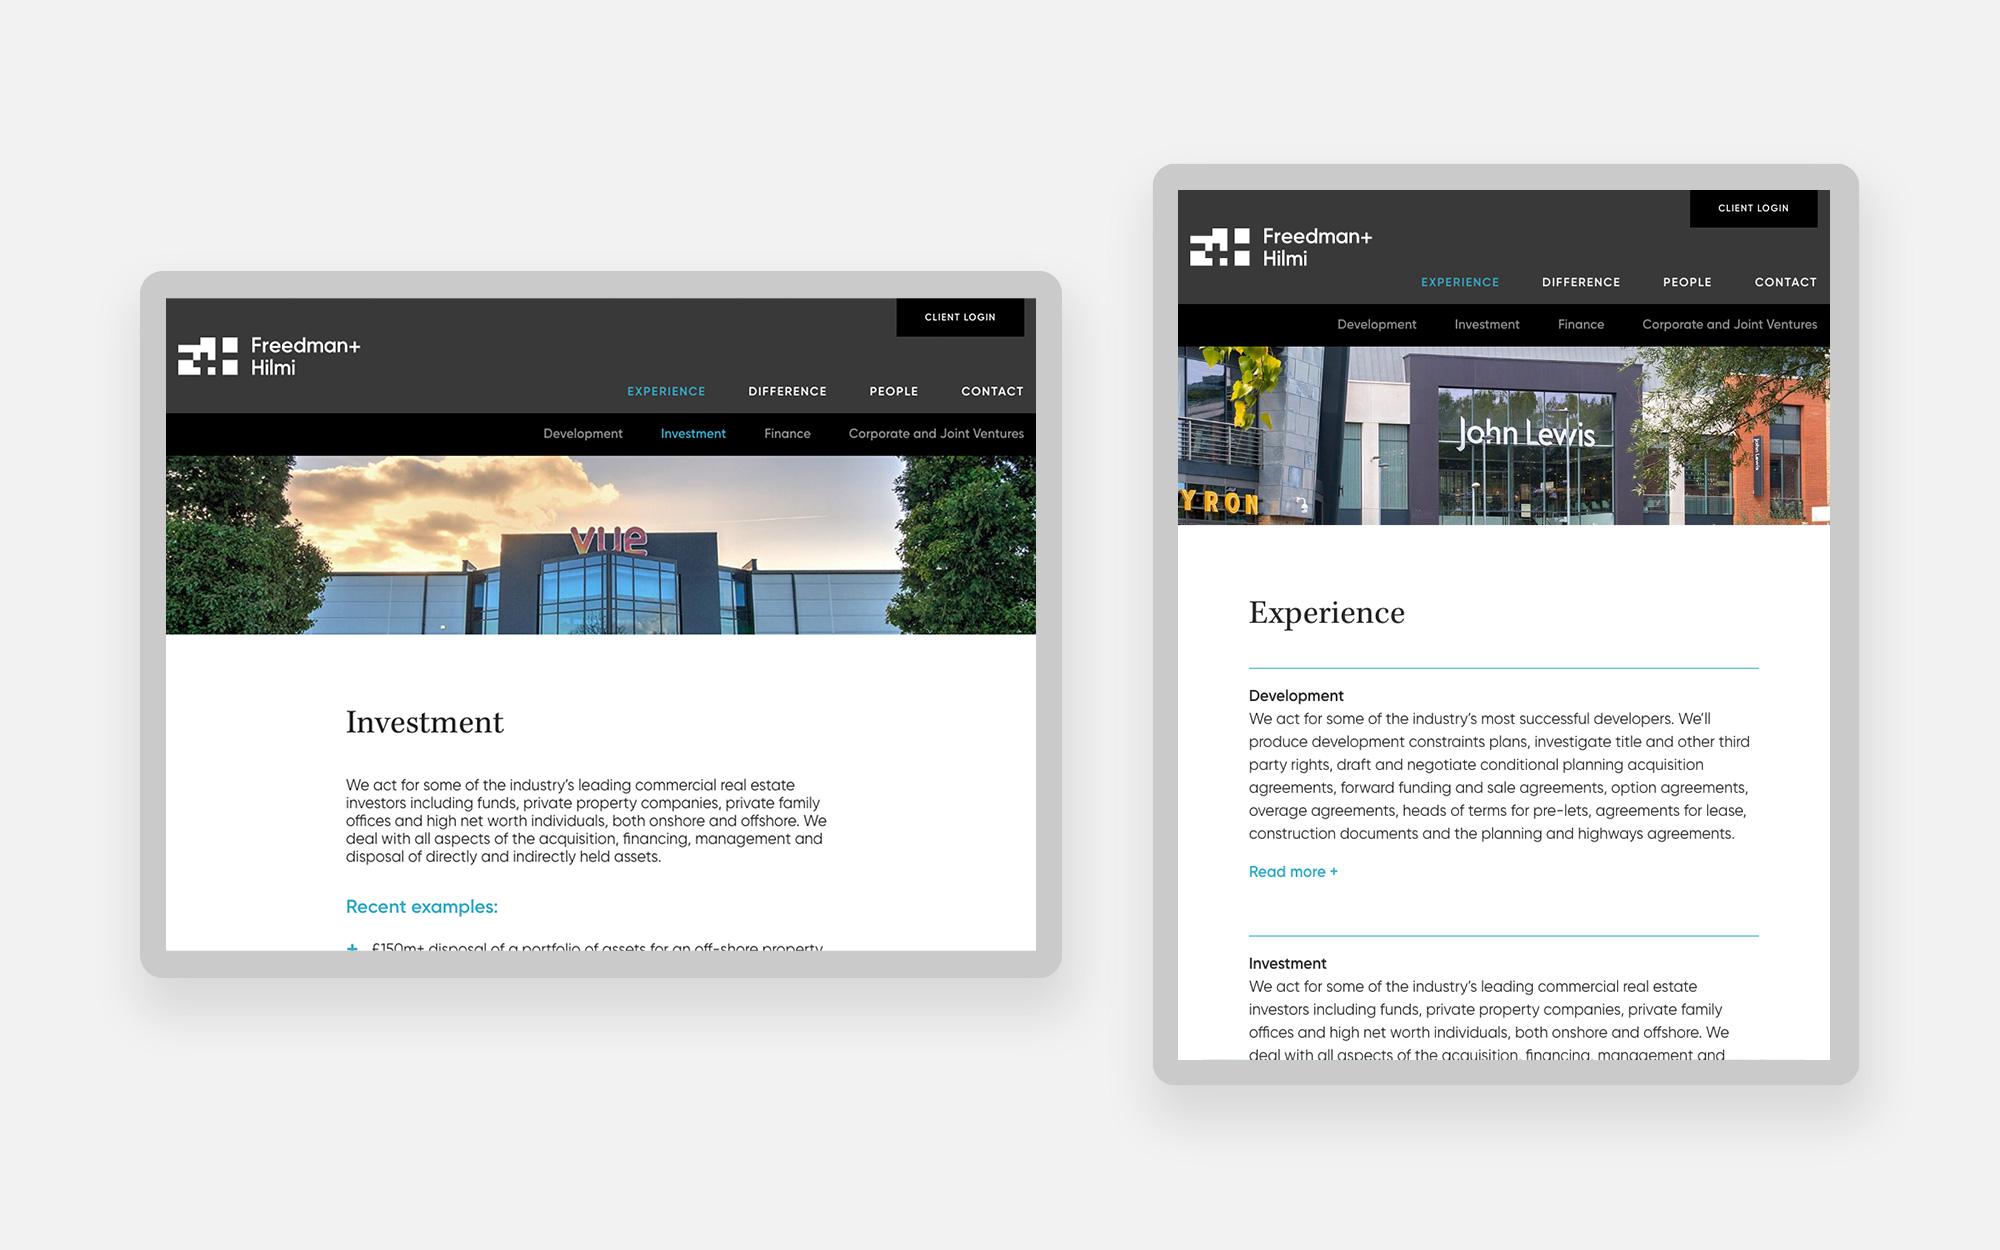 Freedman Hilmi Web design 2